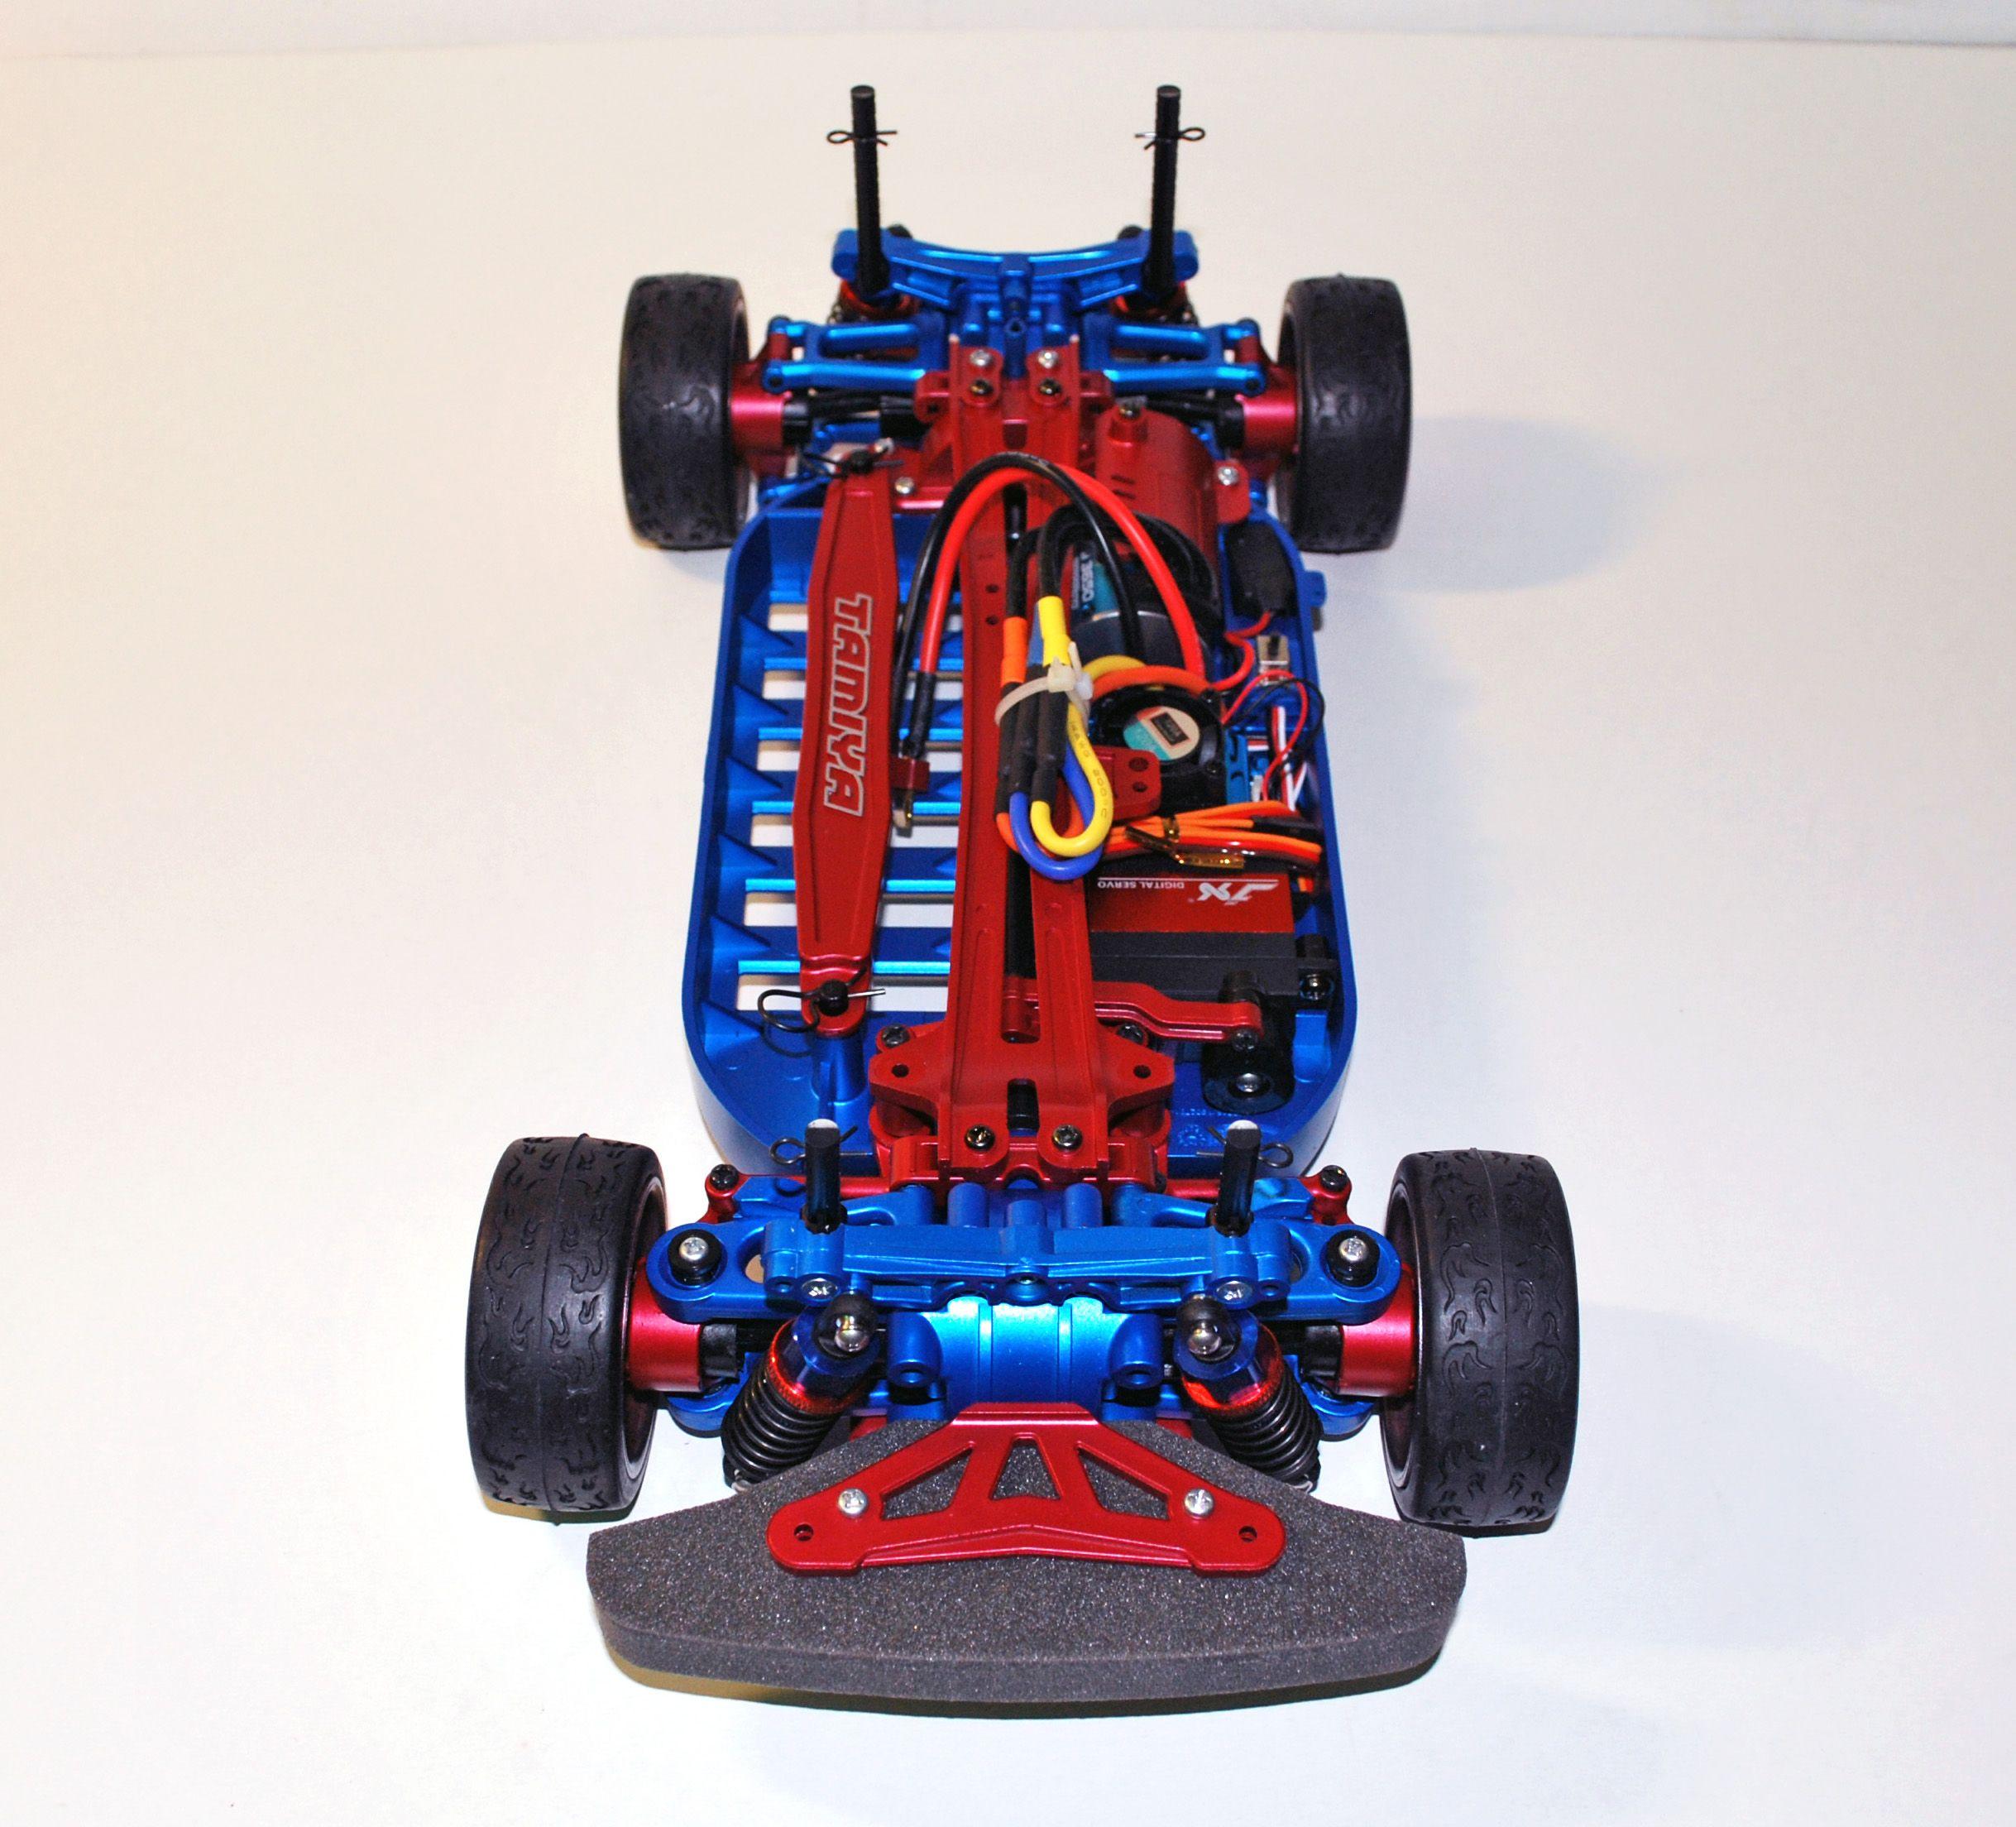 Details about Ultimate Tamiya TT01e Rc Car Custom Built